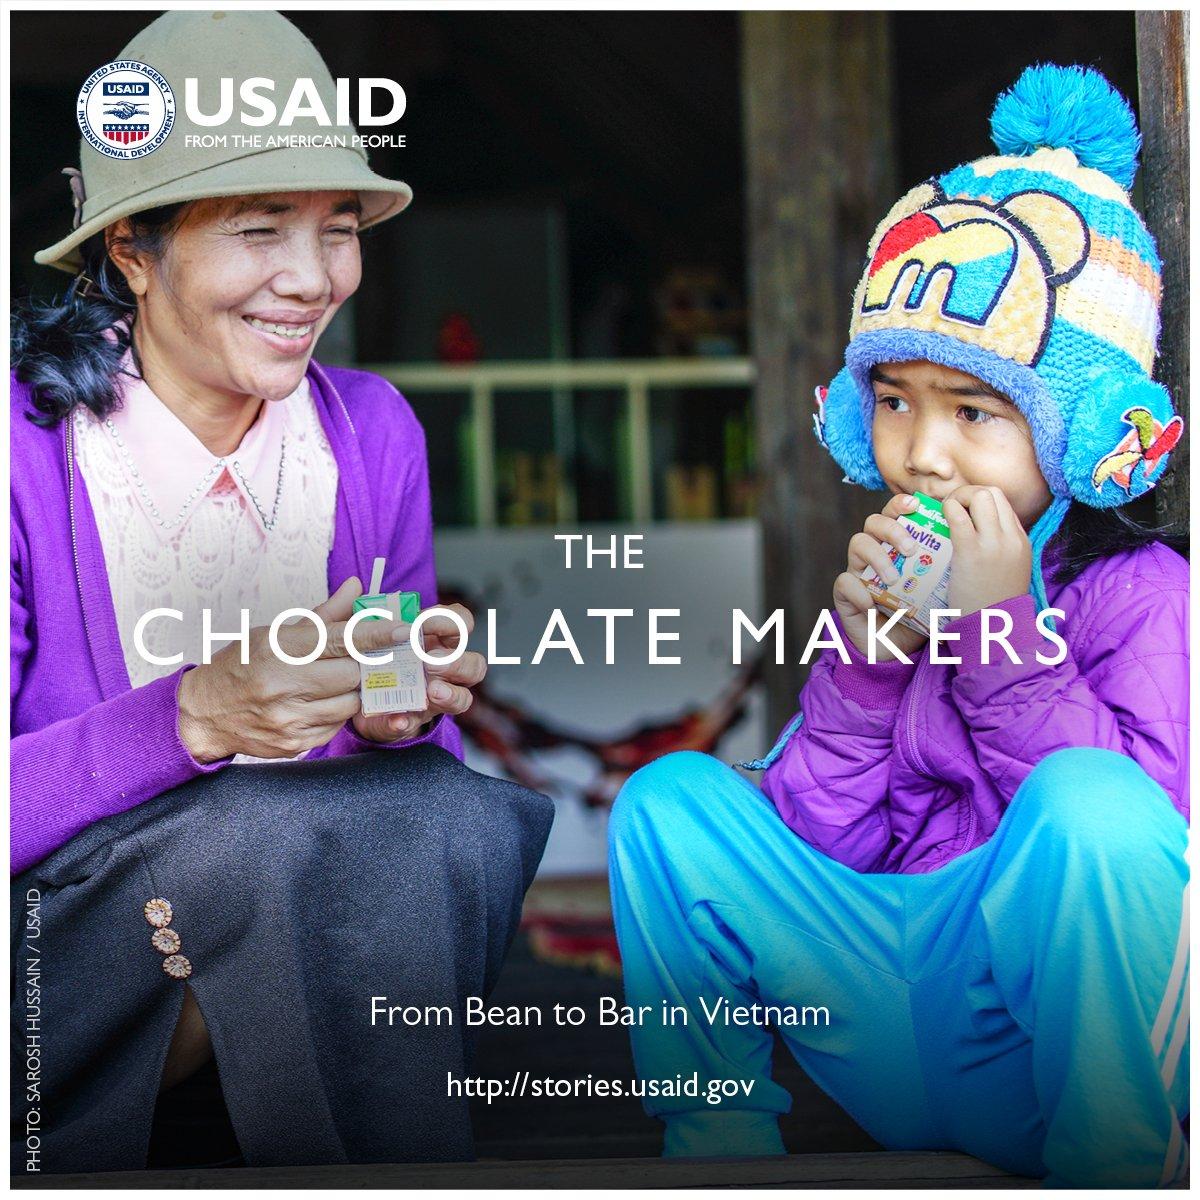 🎥 Meet 'The Chocolate Makers' https://t.co/WF2YJnVuB5 #DevJourney #SelfReliance #USAIDTransforms @USAIDVietnam